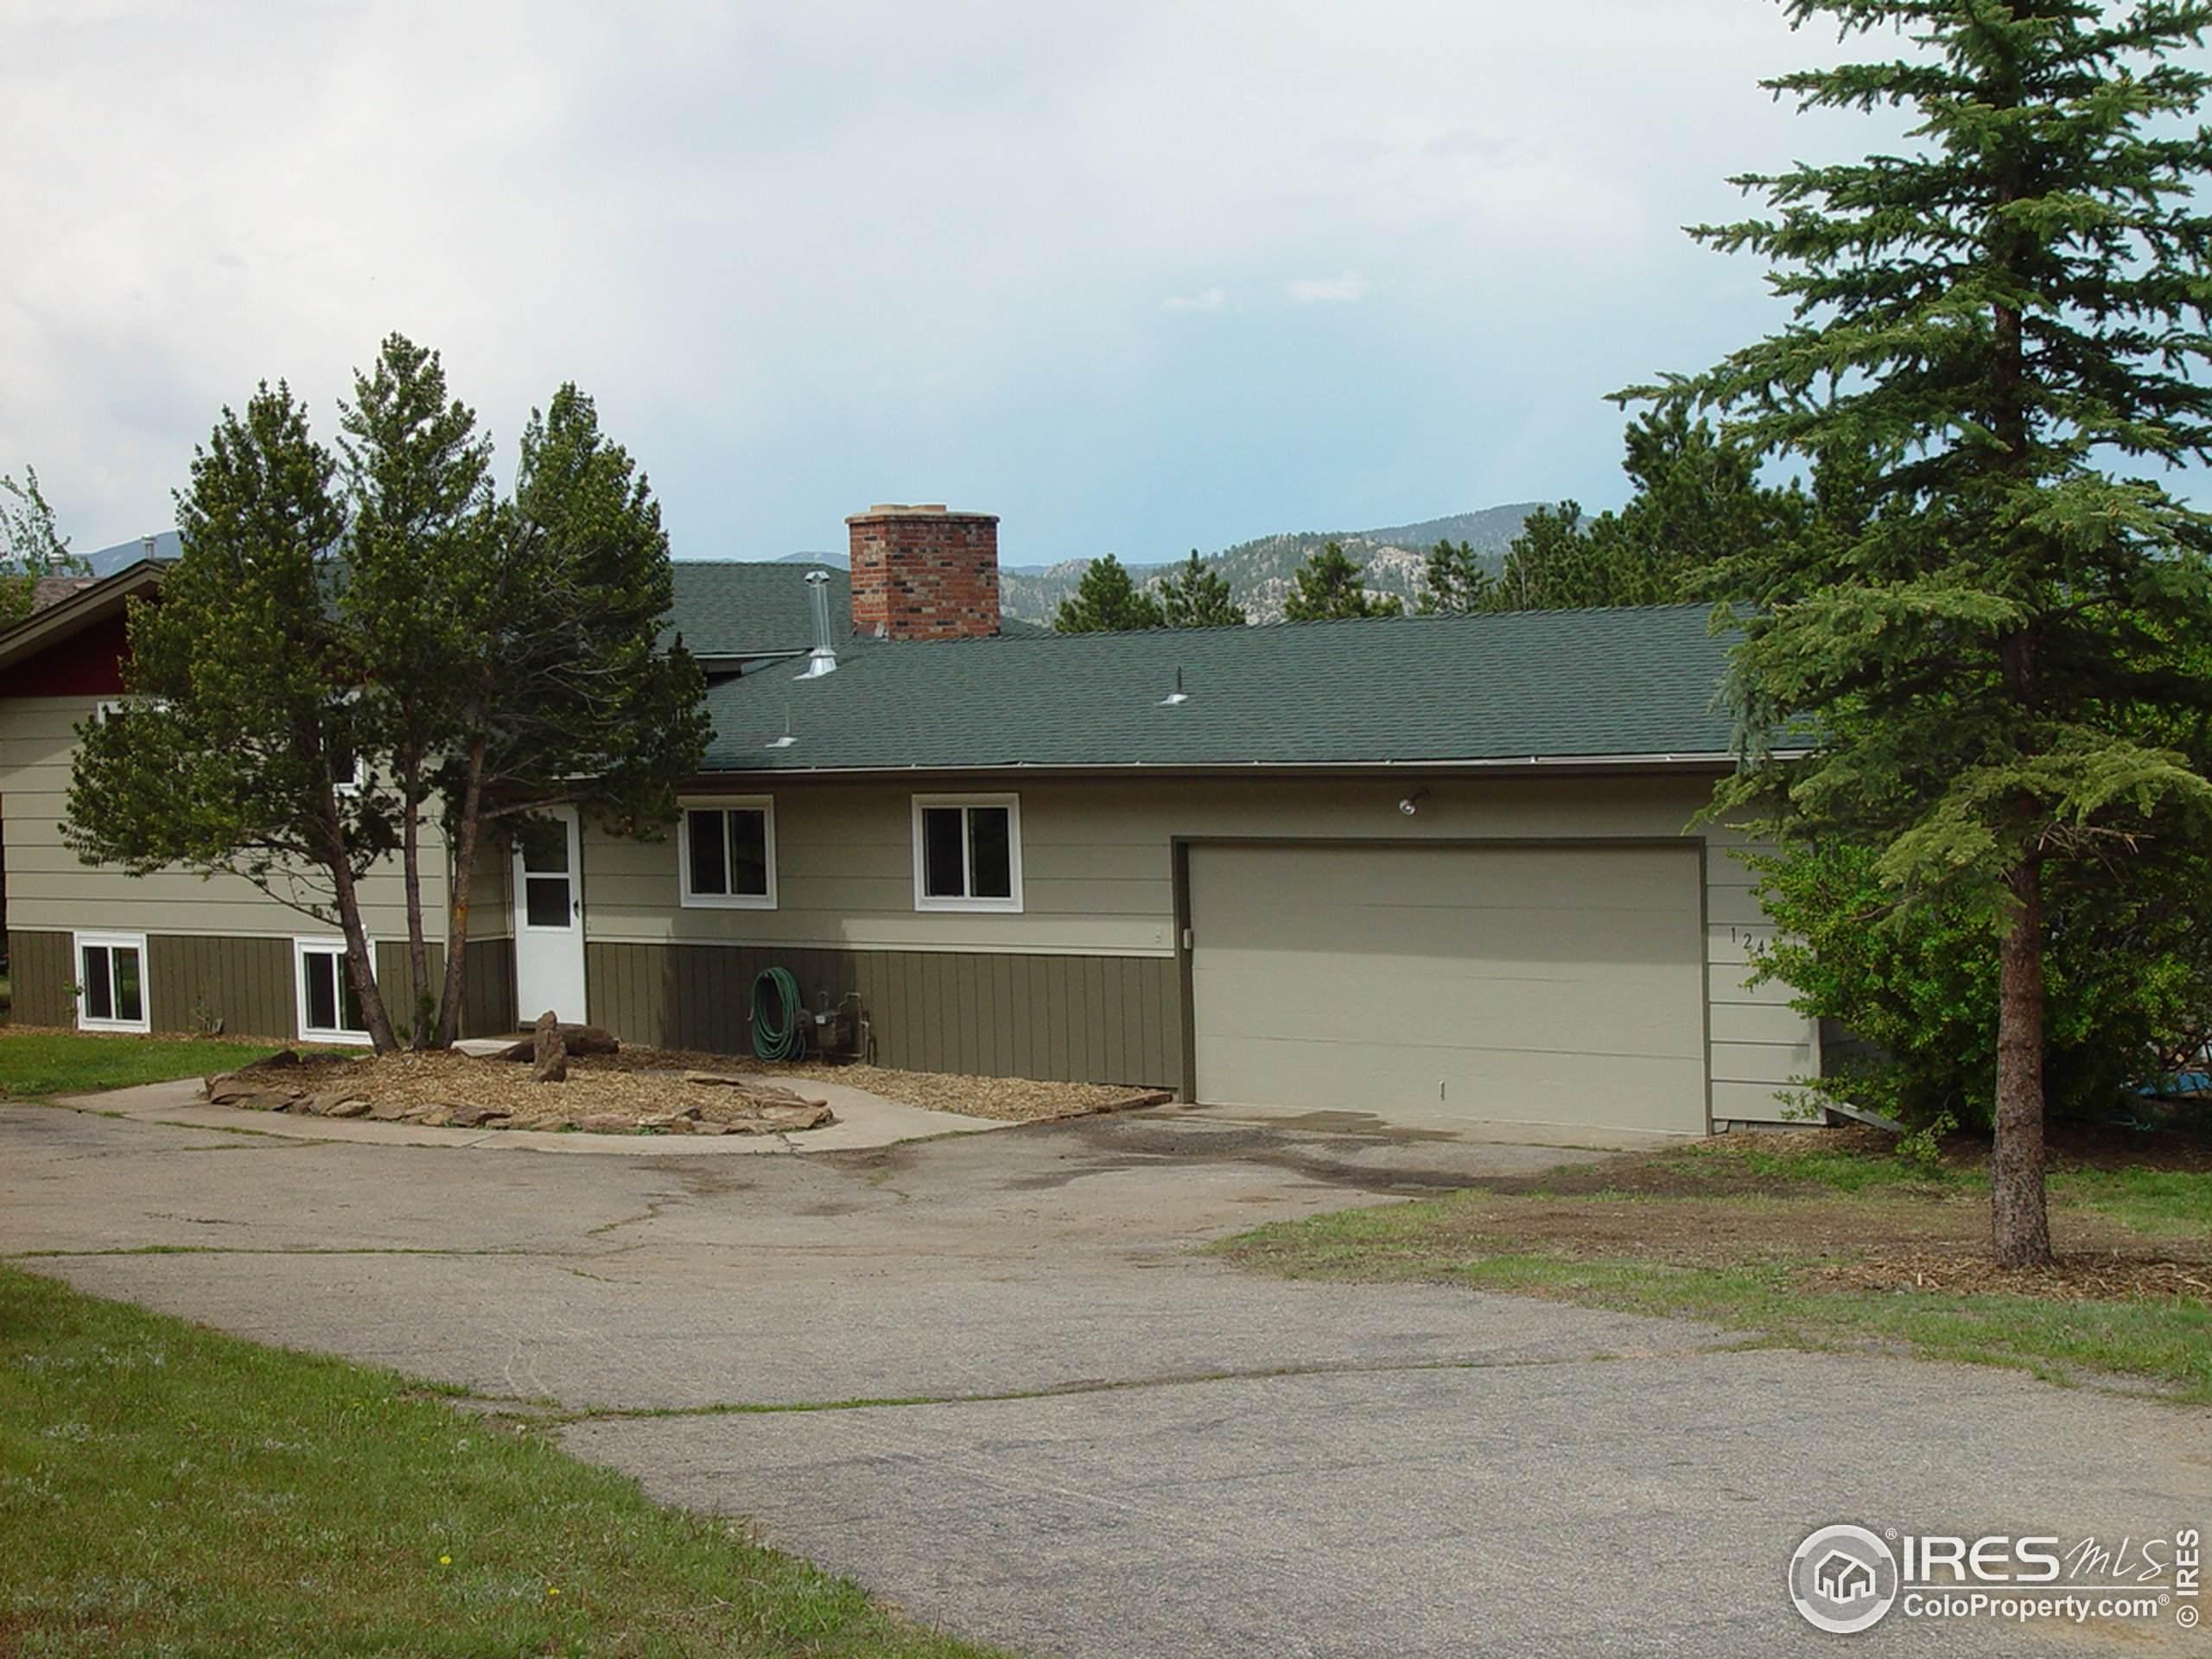 117 Cedar St, Log Lane Village, CO 80705 (MLS #941017) :: RE/MAX Alliance